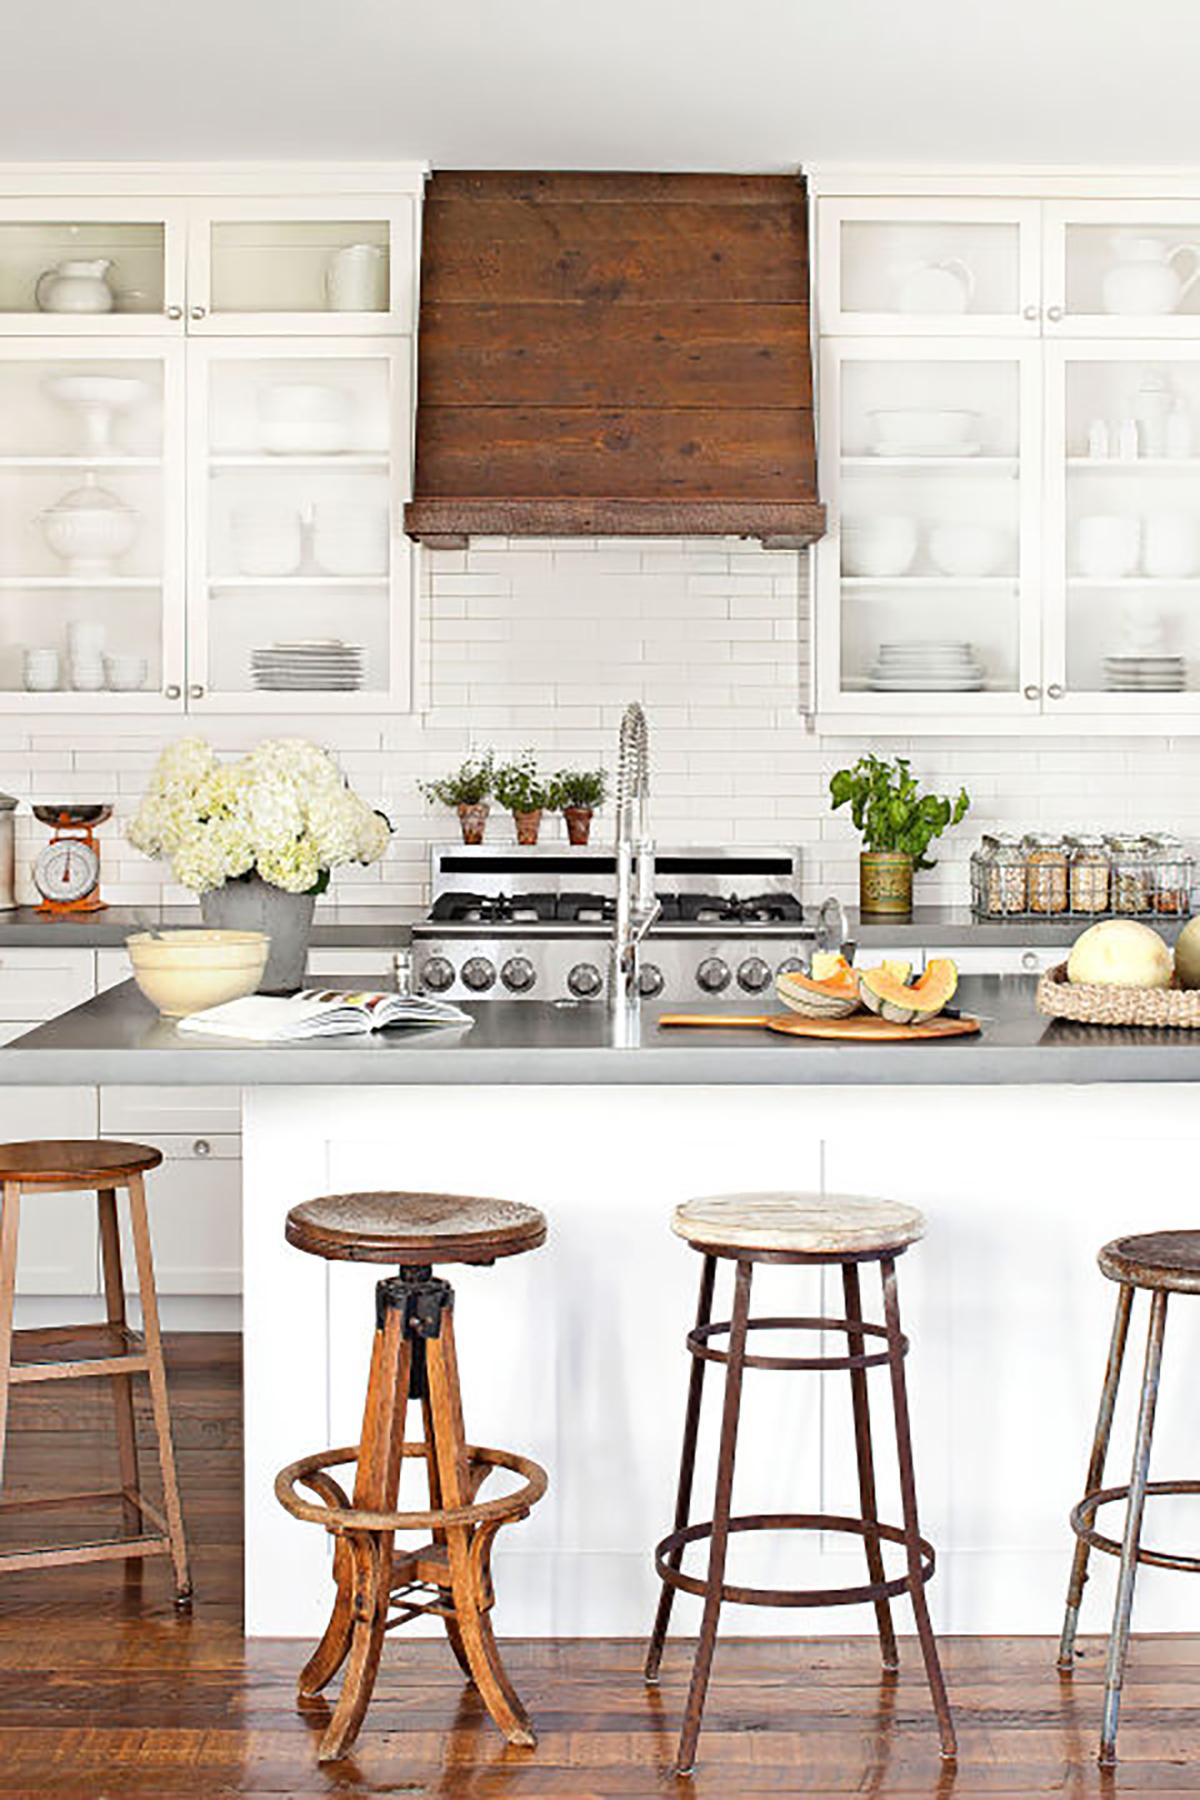 18 Farmhouse Style Kitchens - Rustic Decor Ideas for Kitchens on Farm House Kitchen Ideas  id=49910